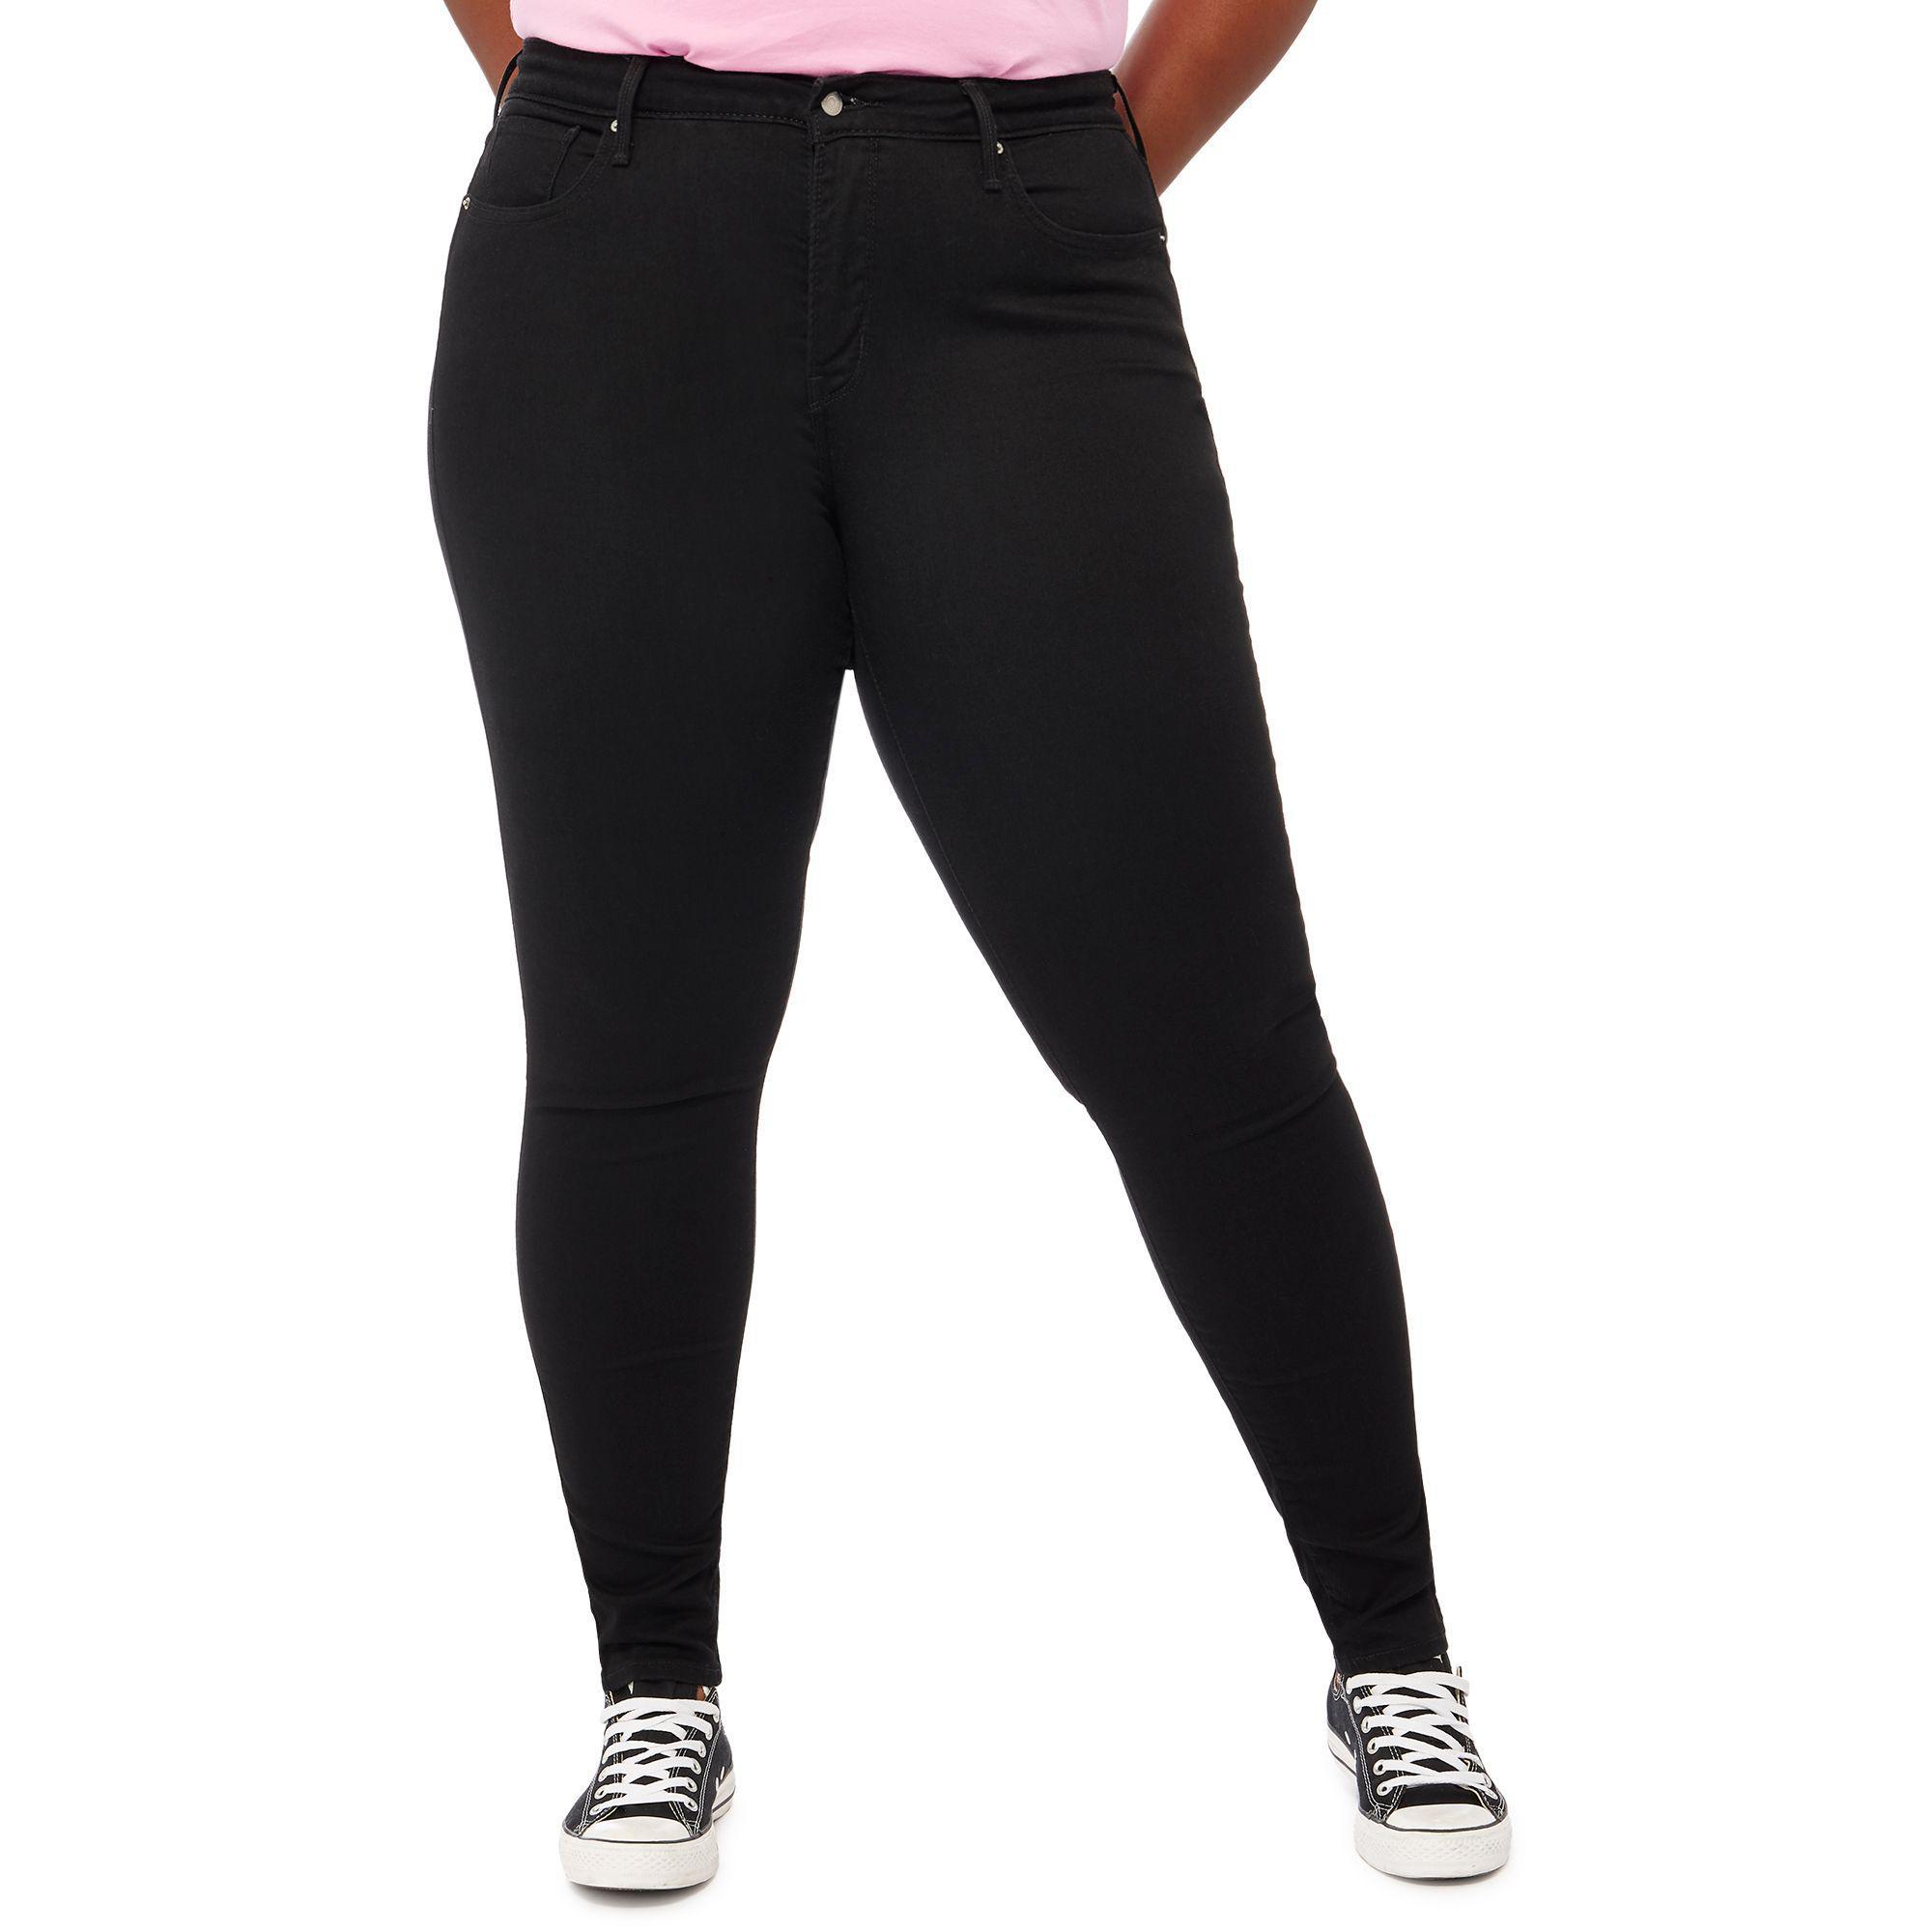 0df530b46ac38 Levi s. Women s Black Dark Wash  310  Shaping Plus Size Super Skinny Jeans